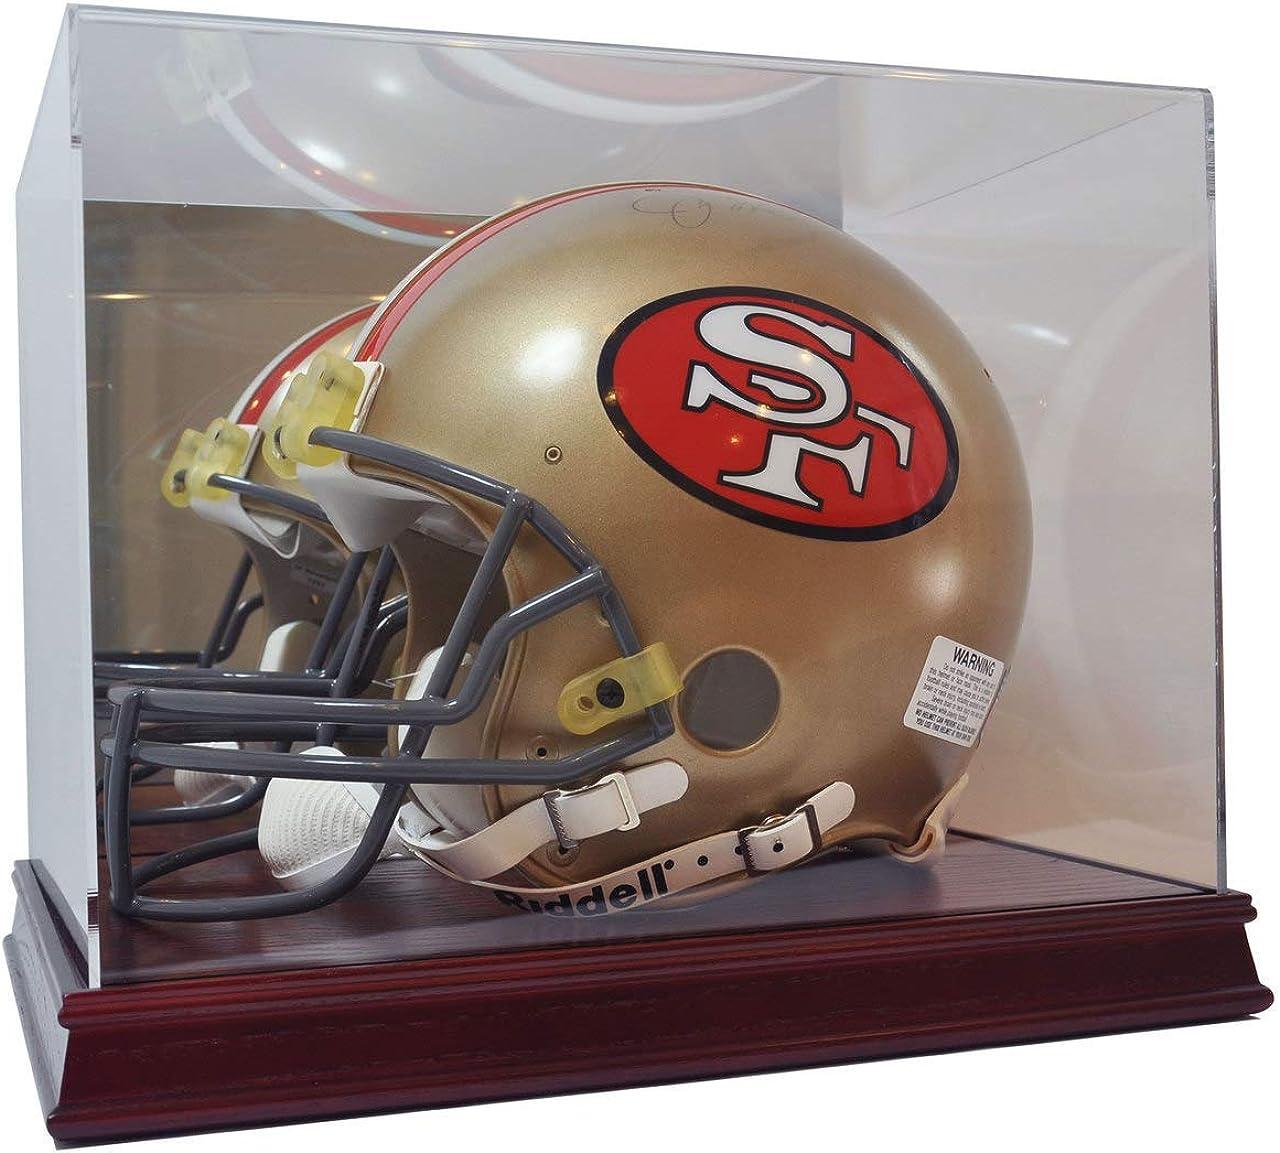 Image of Deluxe Acrylic Wood Base Football Helmet Display Case Display Cases